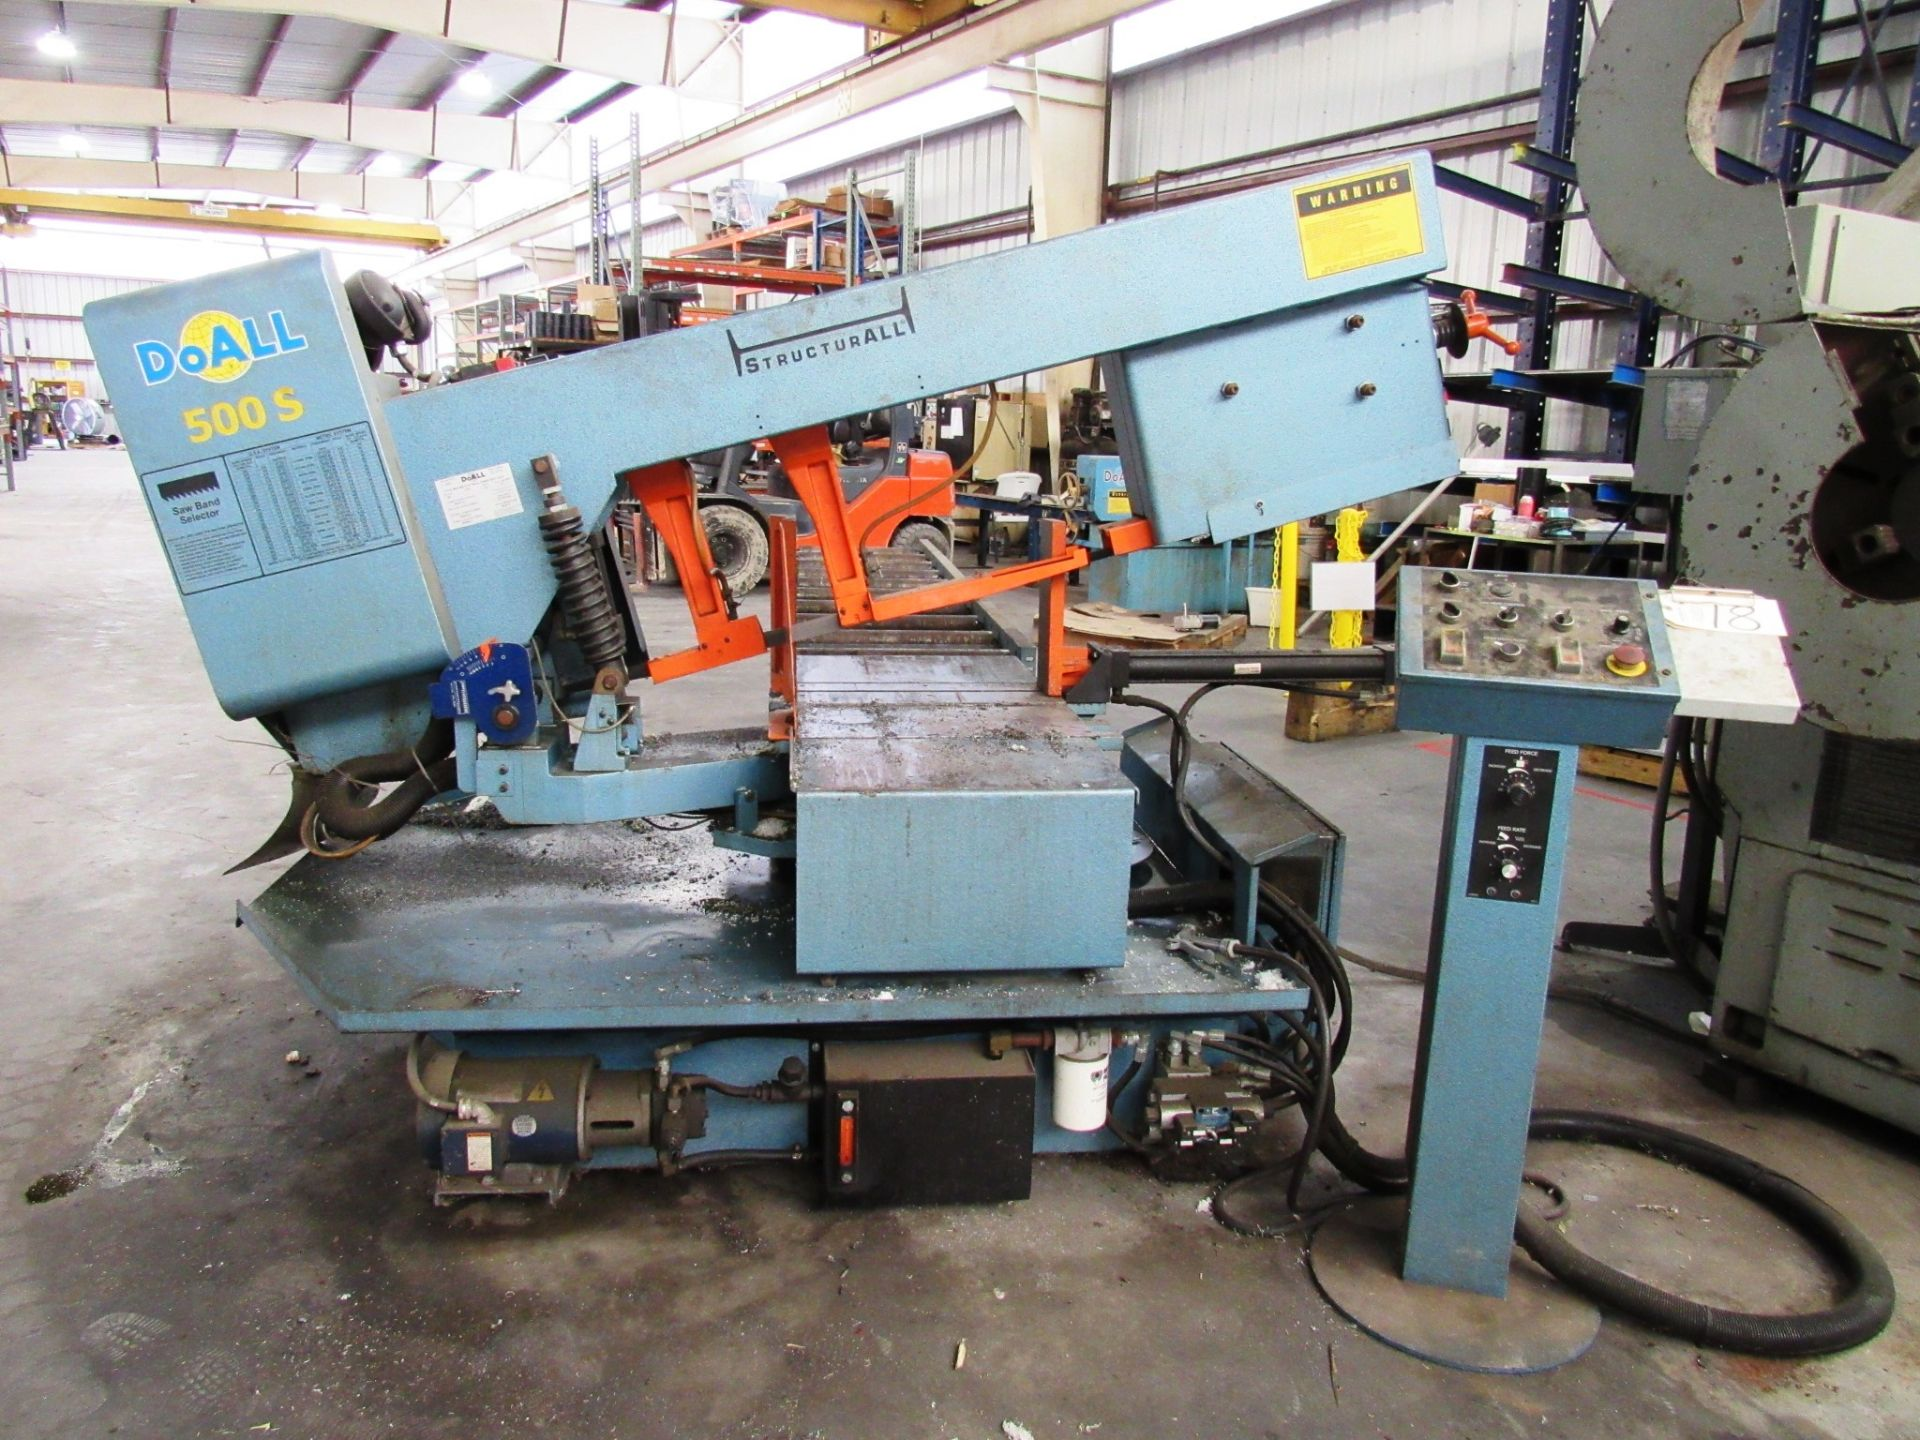 Lot 18 - DoAll 500S Mitre Cutting Horizontal Bandsaw